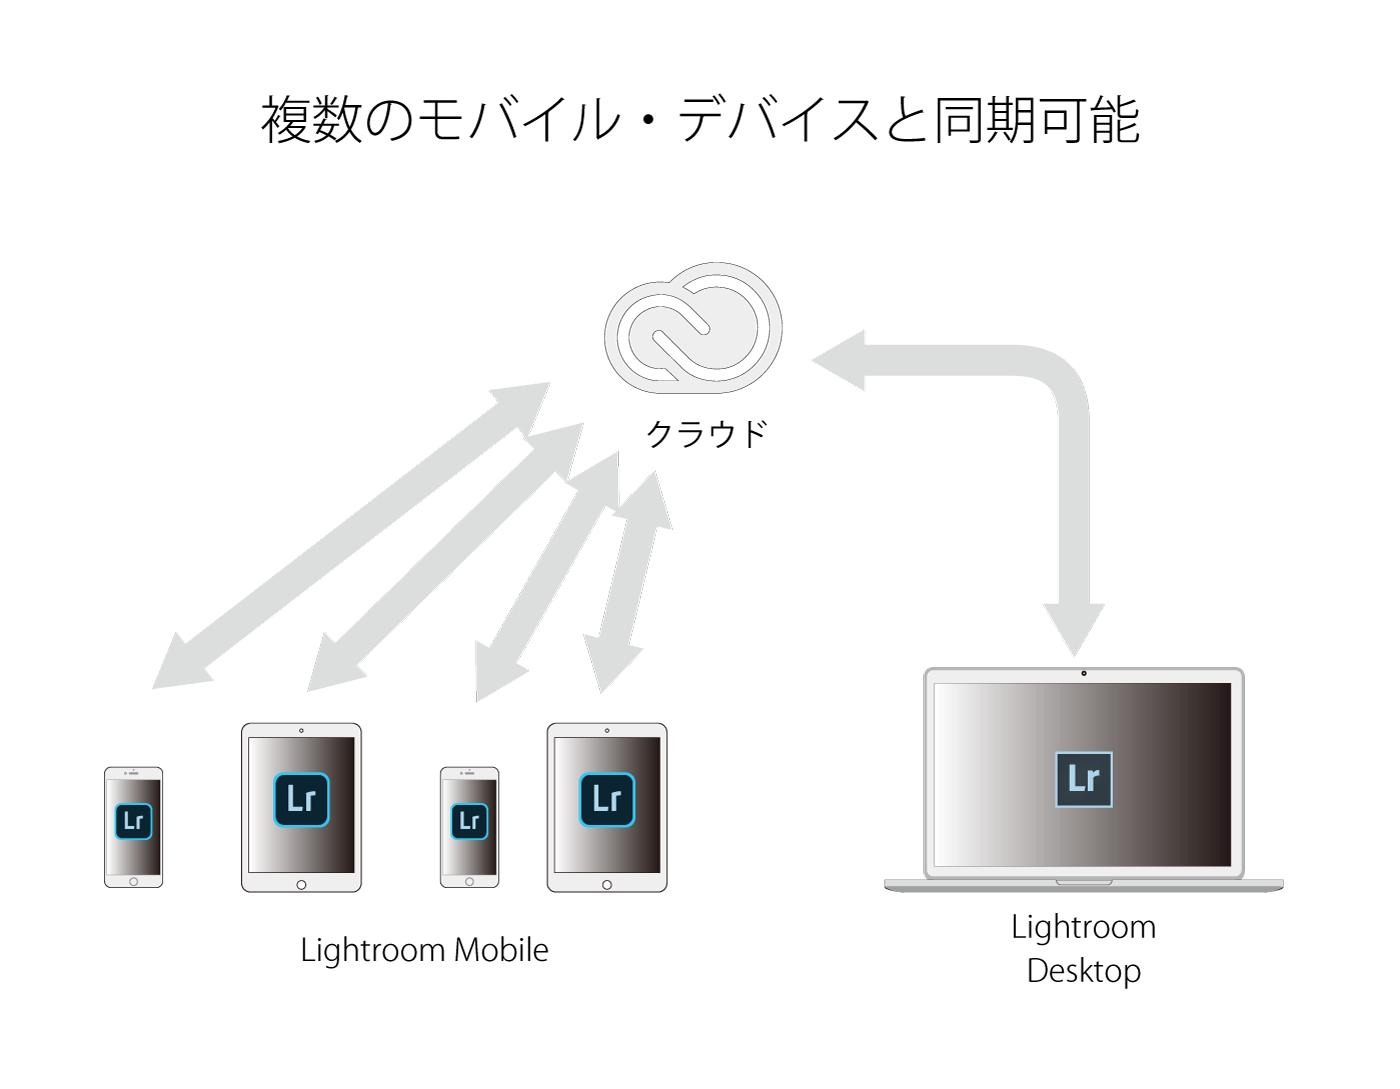 Lightroom_Mobile_複数のデバイス